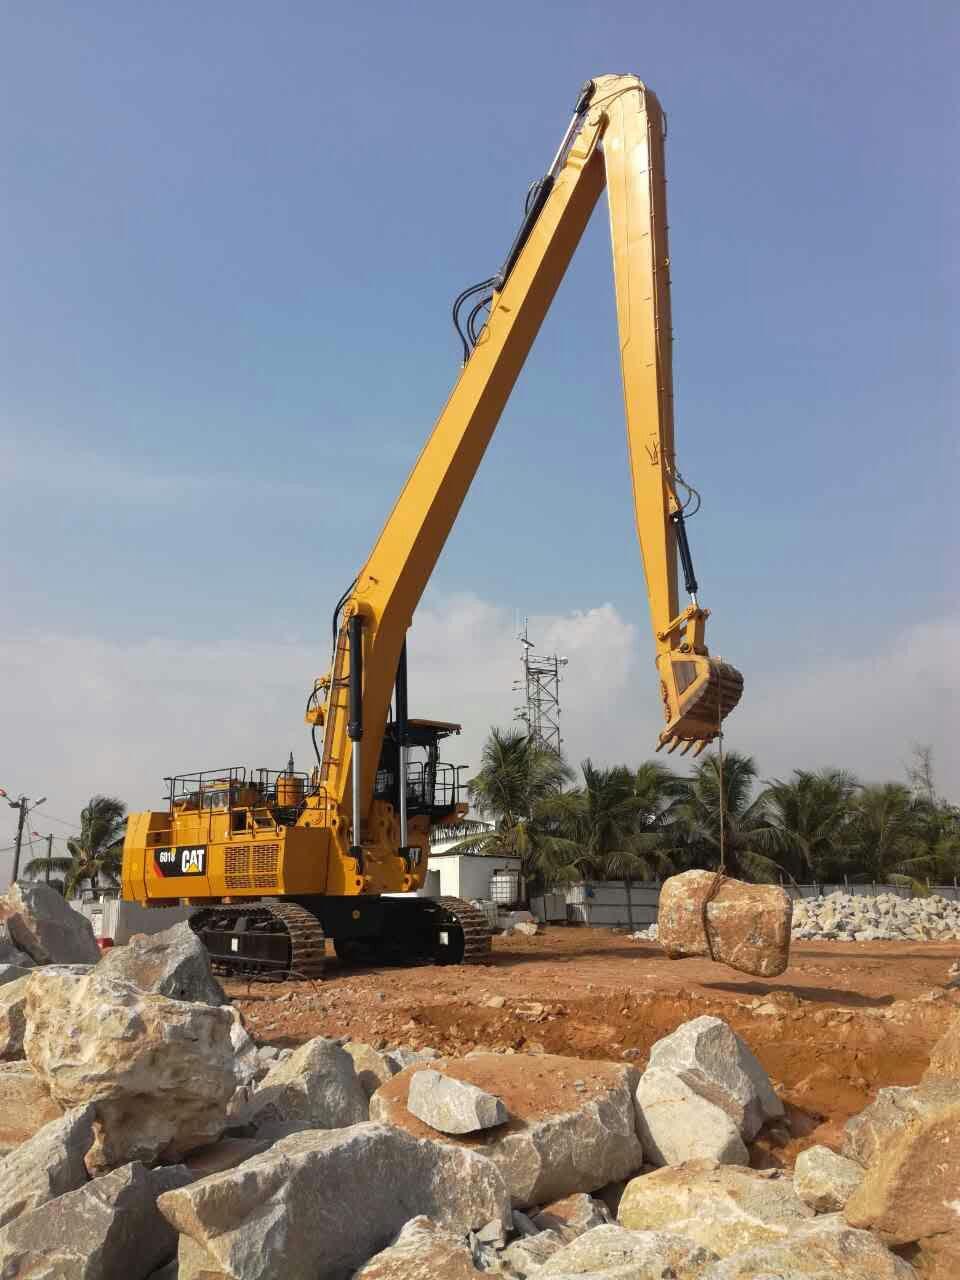 The longest reach boom for the biggest excavator Cat6018